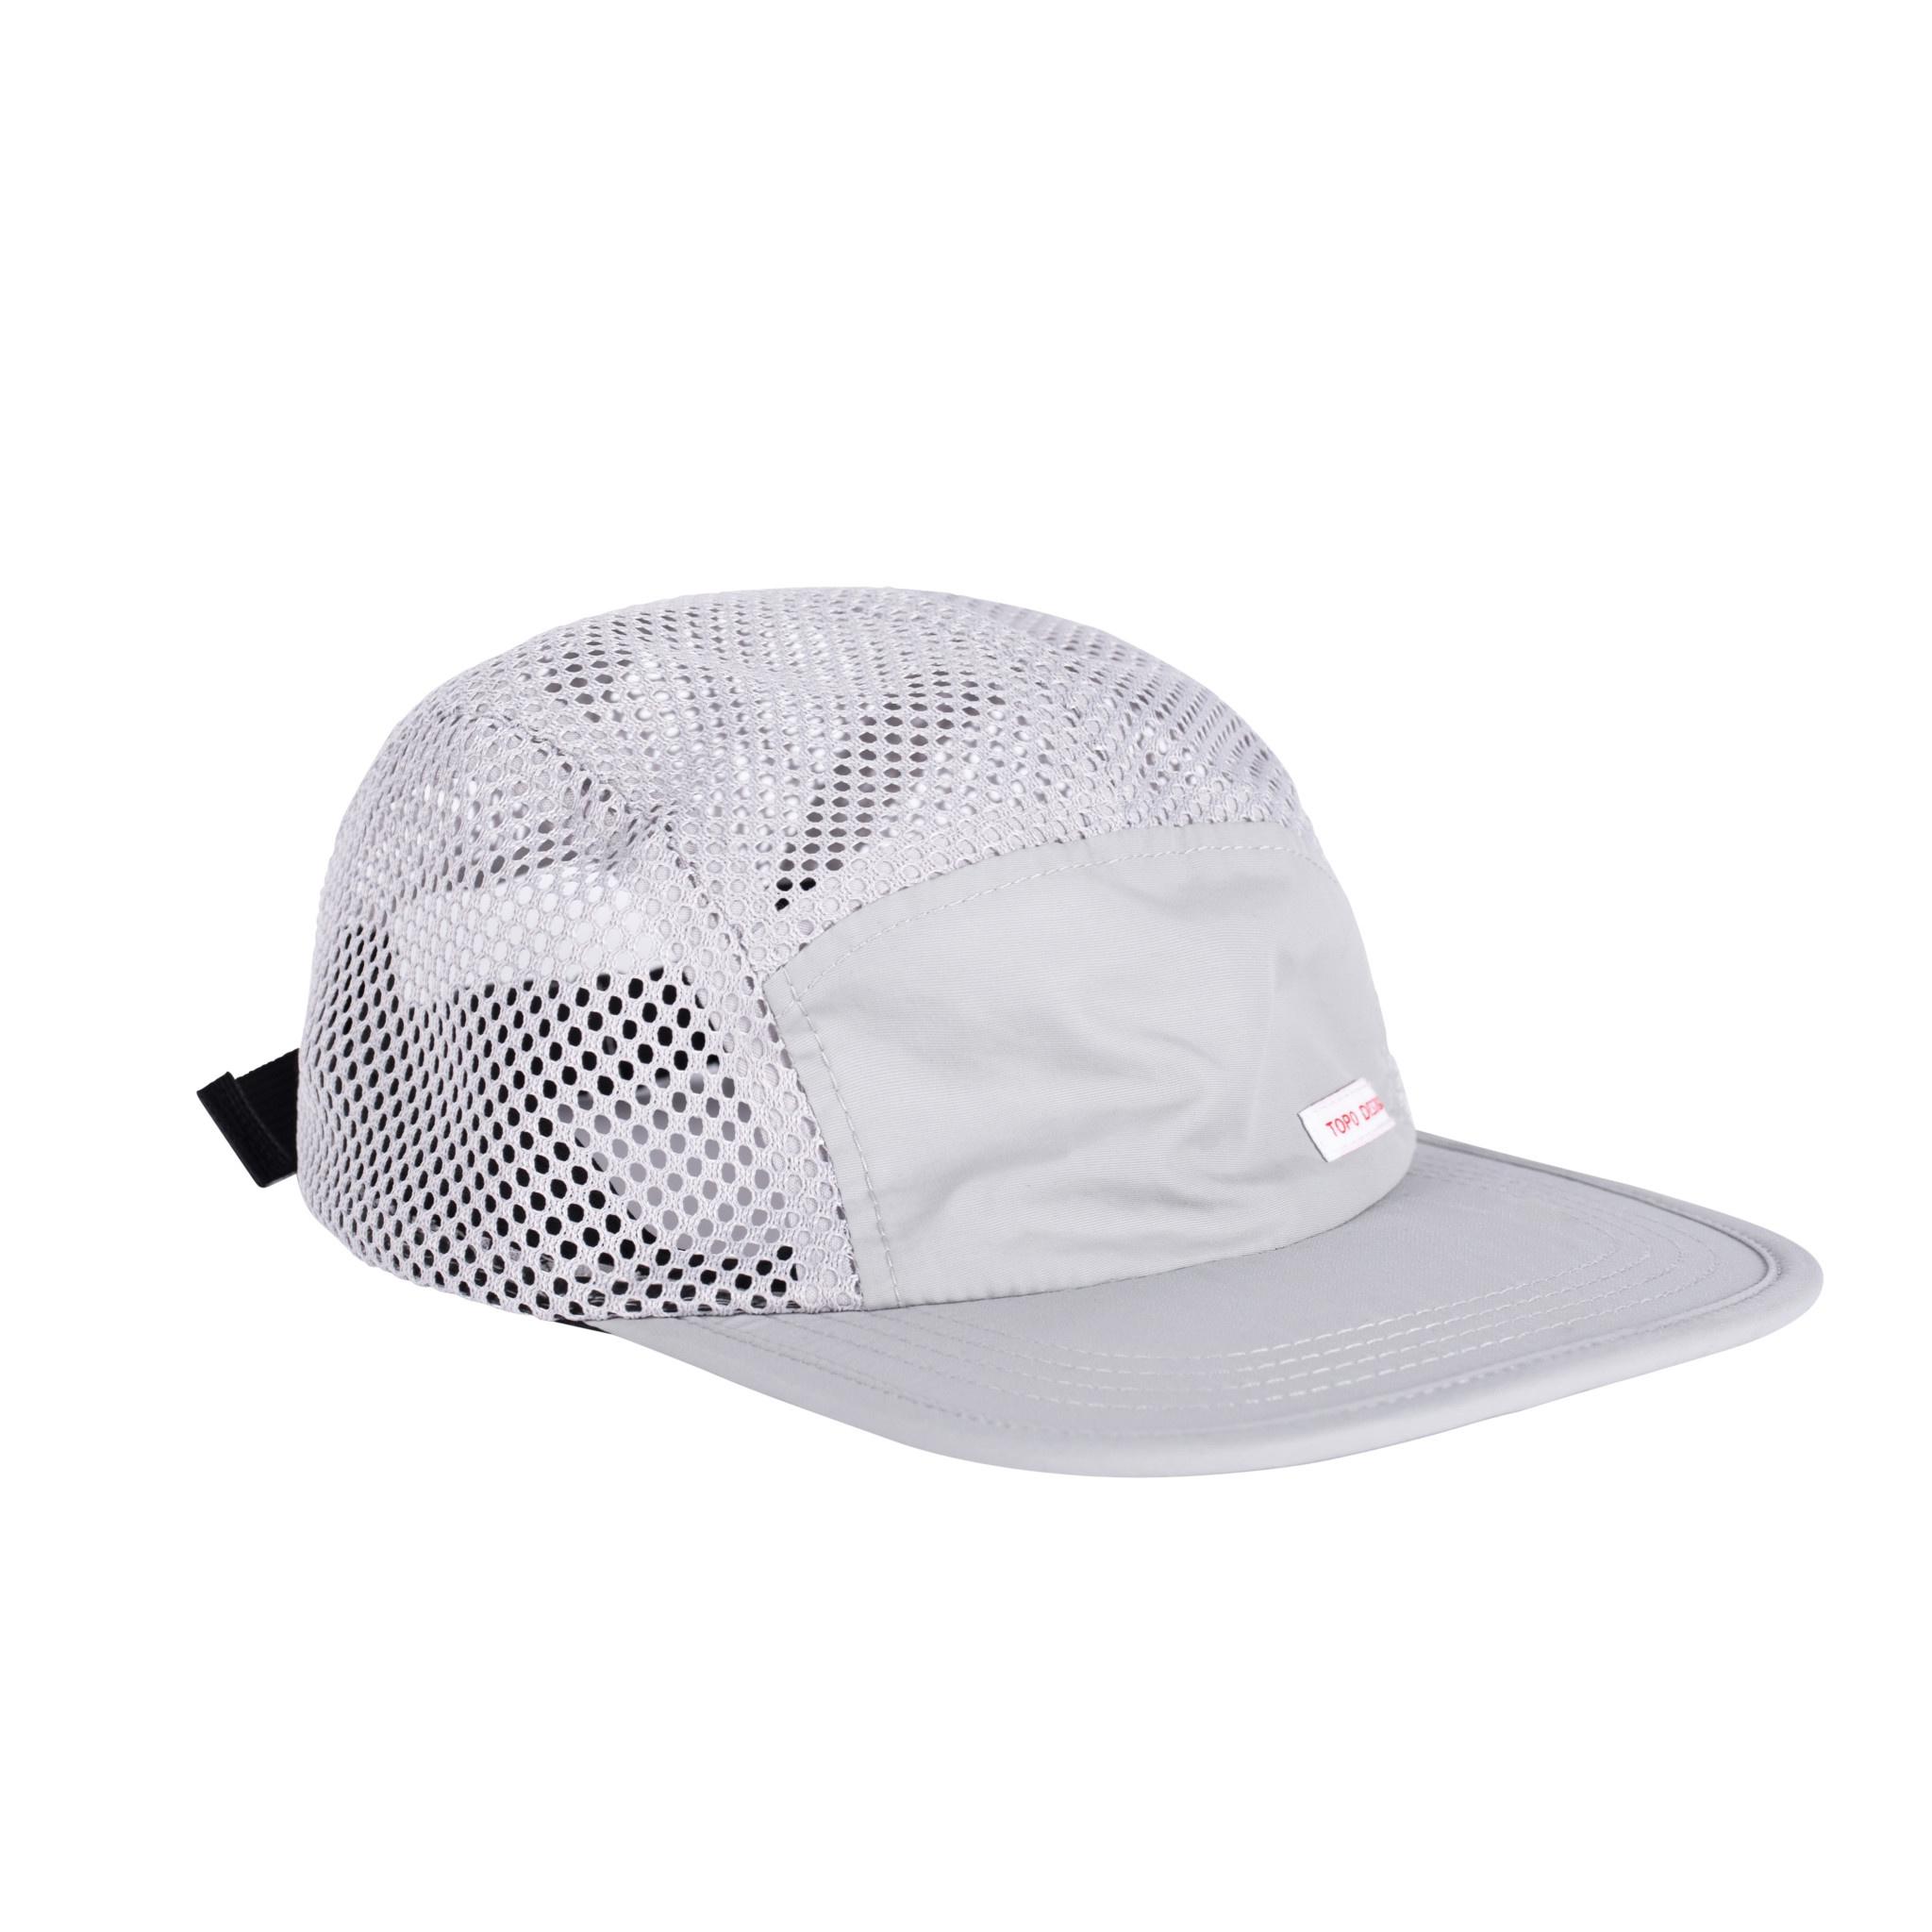 Topo Designs Topo Designs Global Hat - Grey